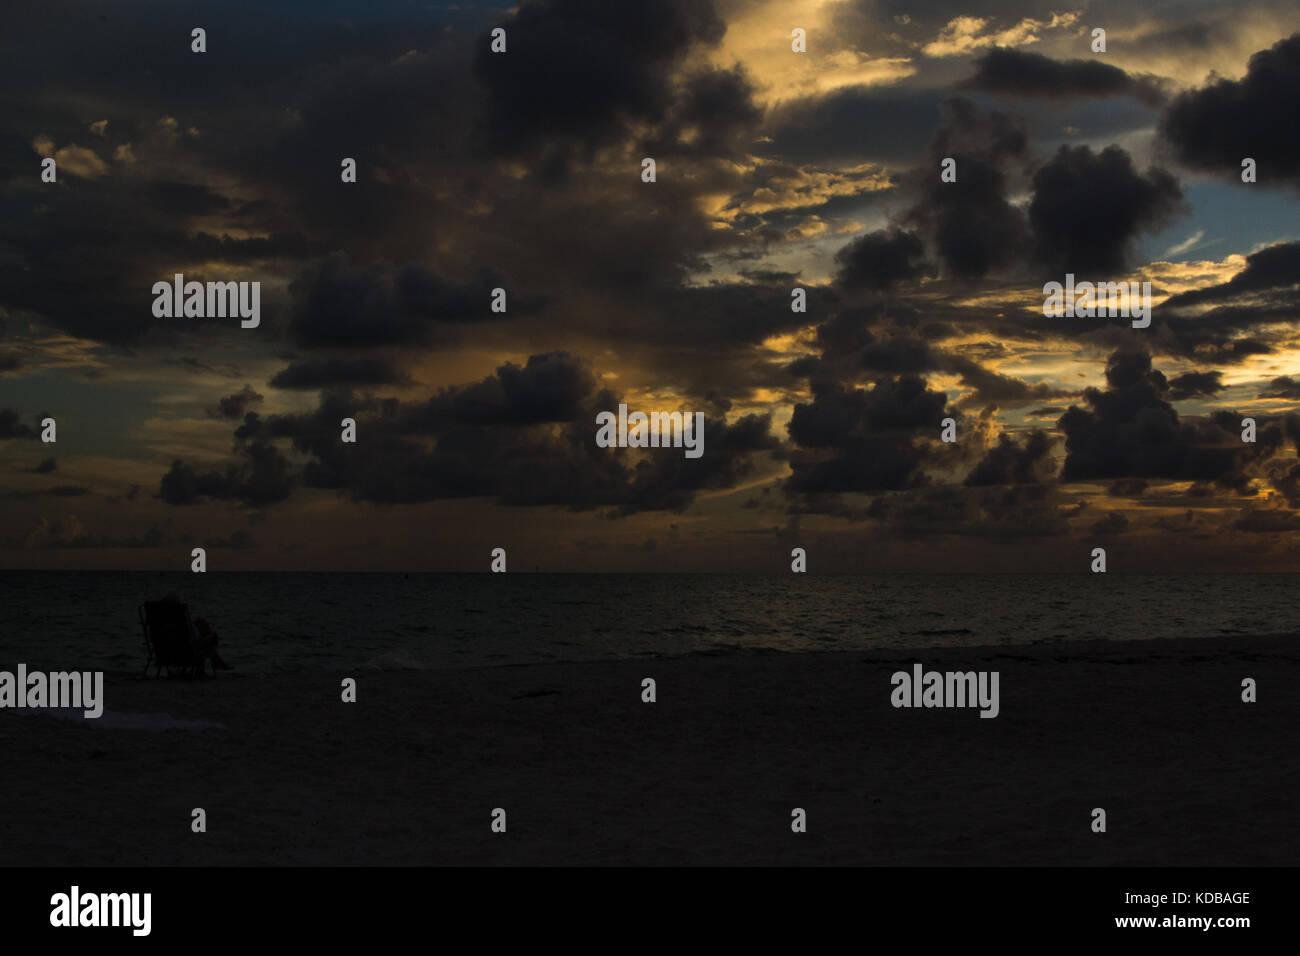 Sunset at Siesta Key, Florida. - Stock Image